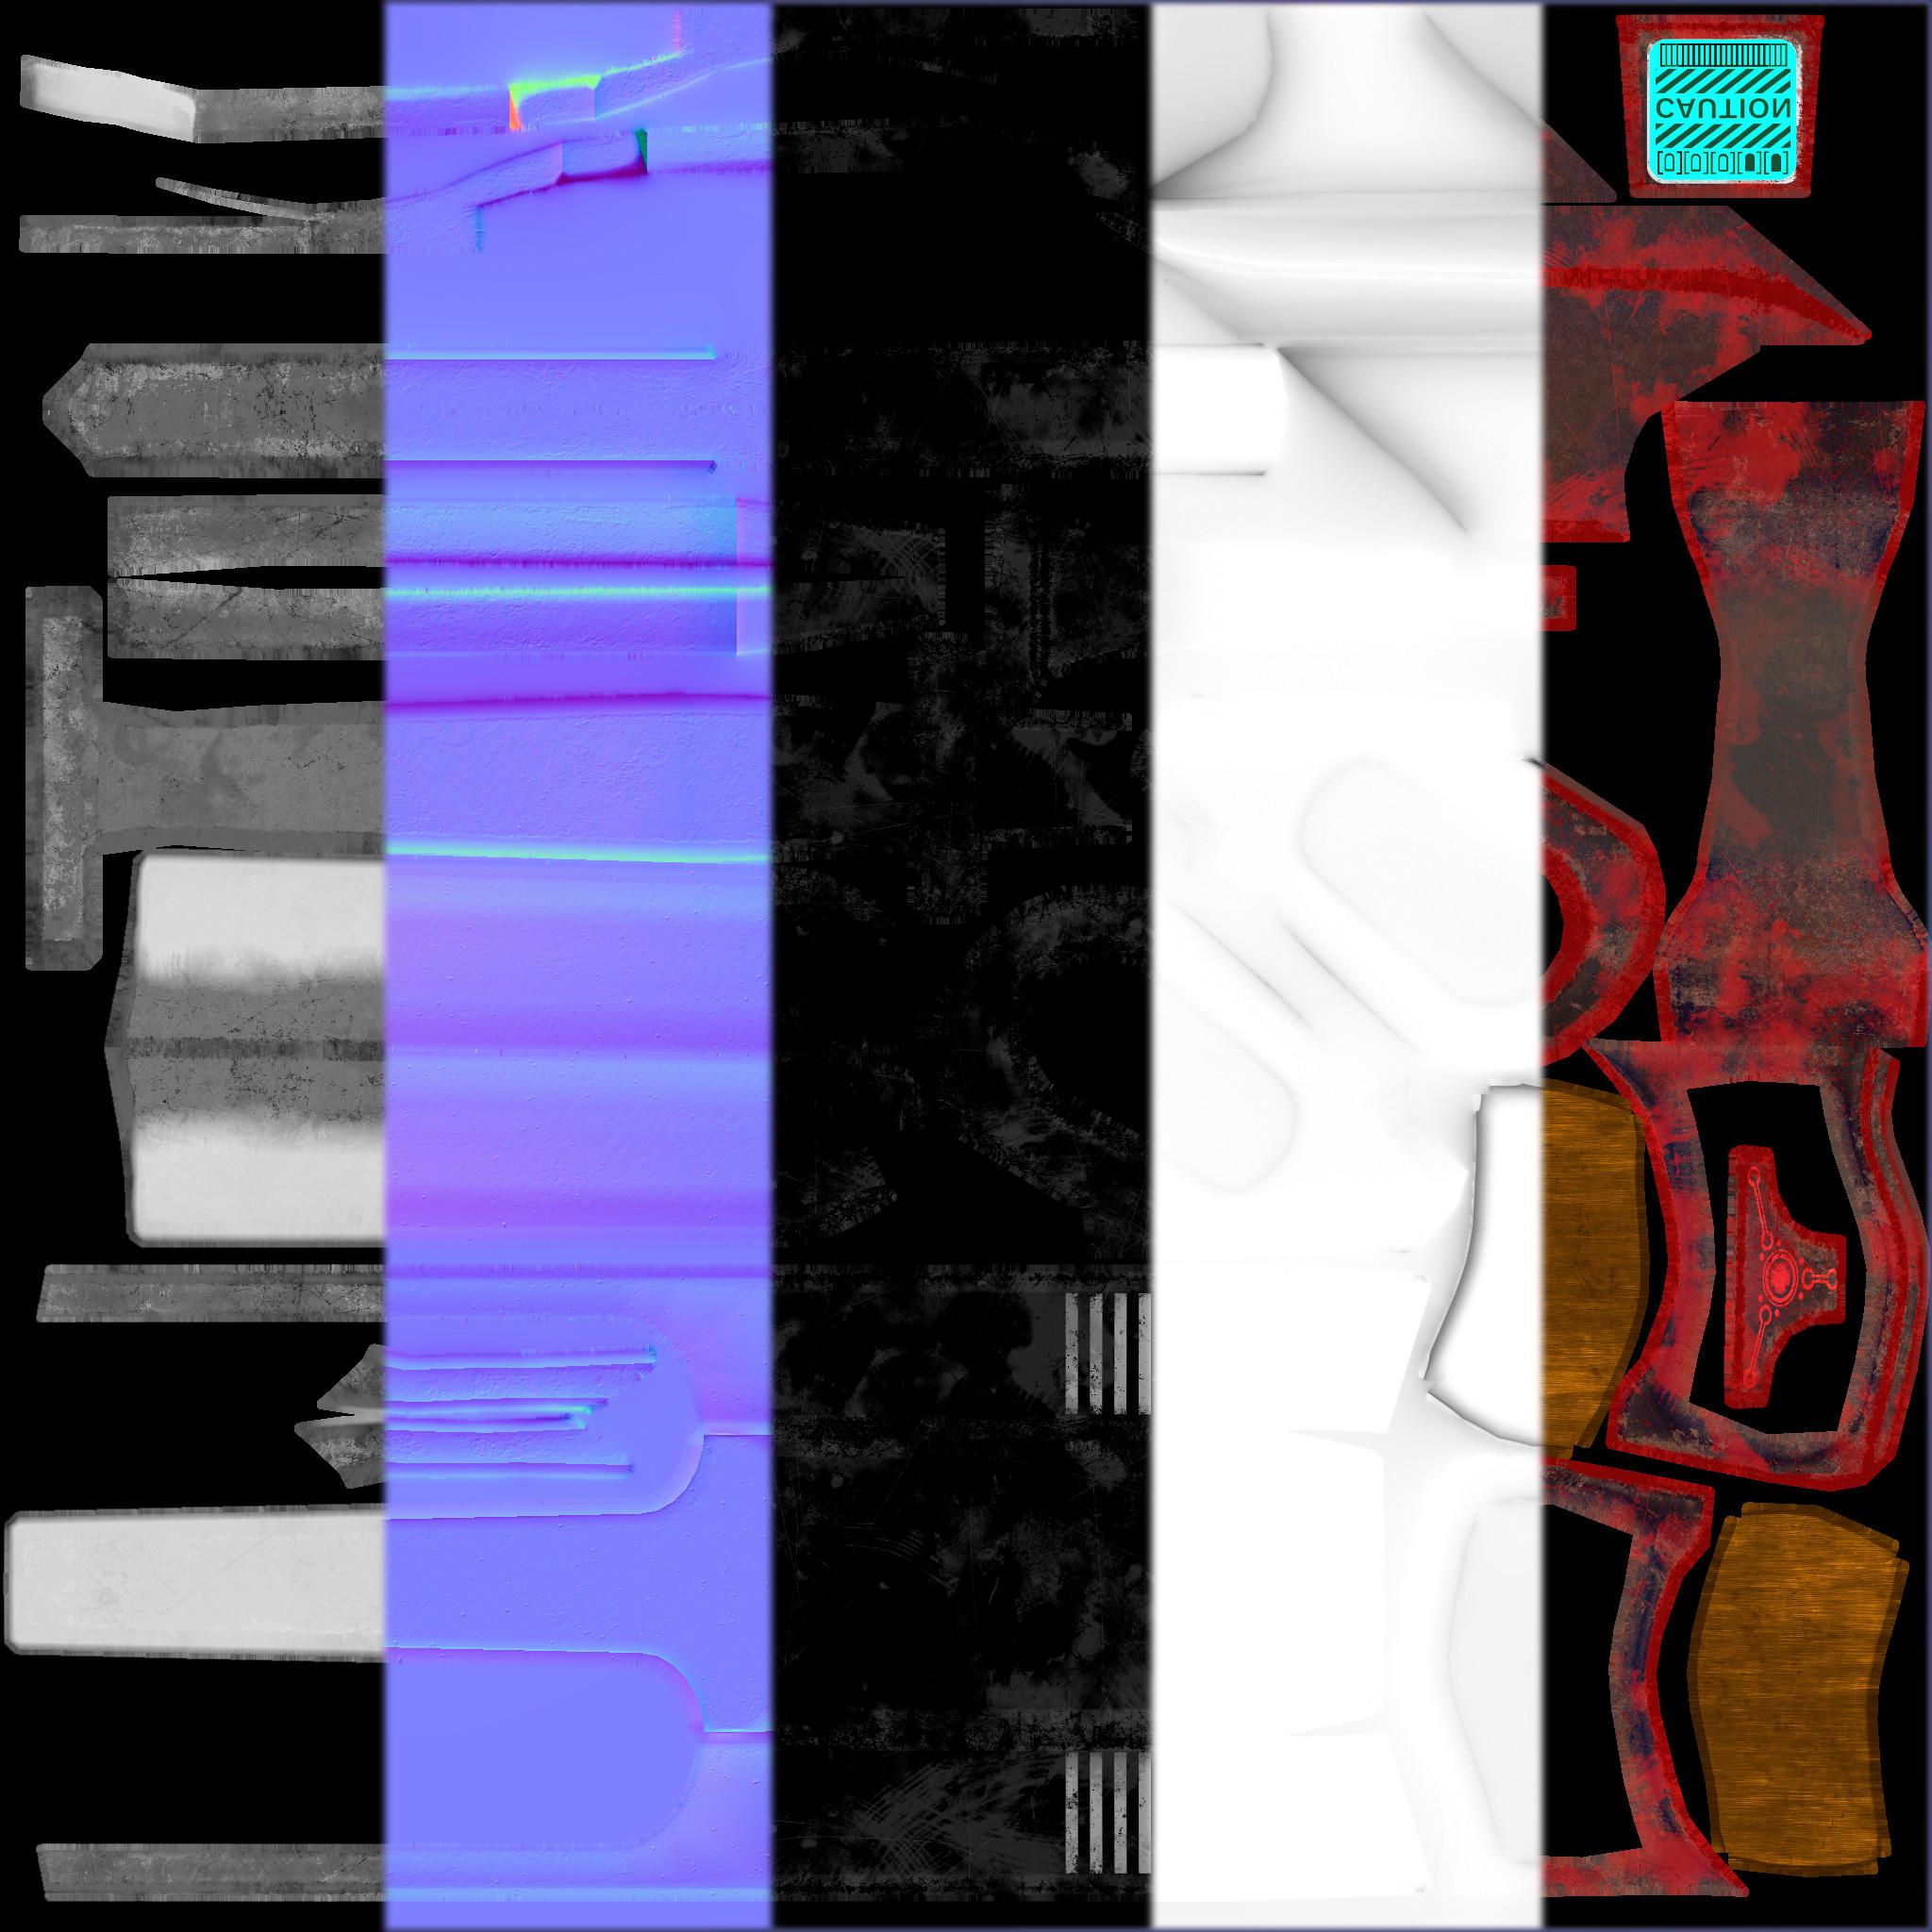 2K PBR Texture W/ Emissive overlay on diffuse.